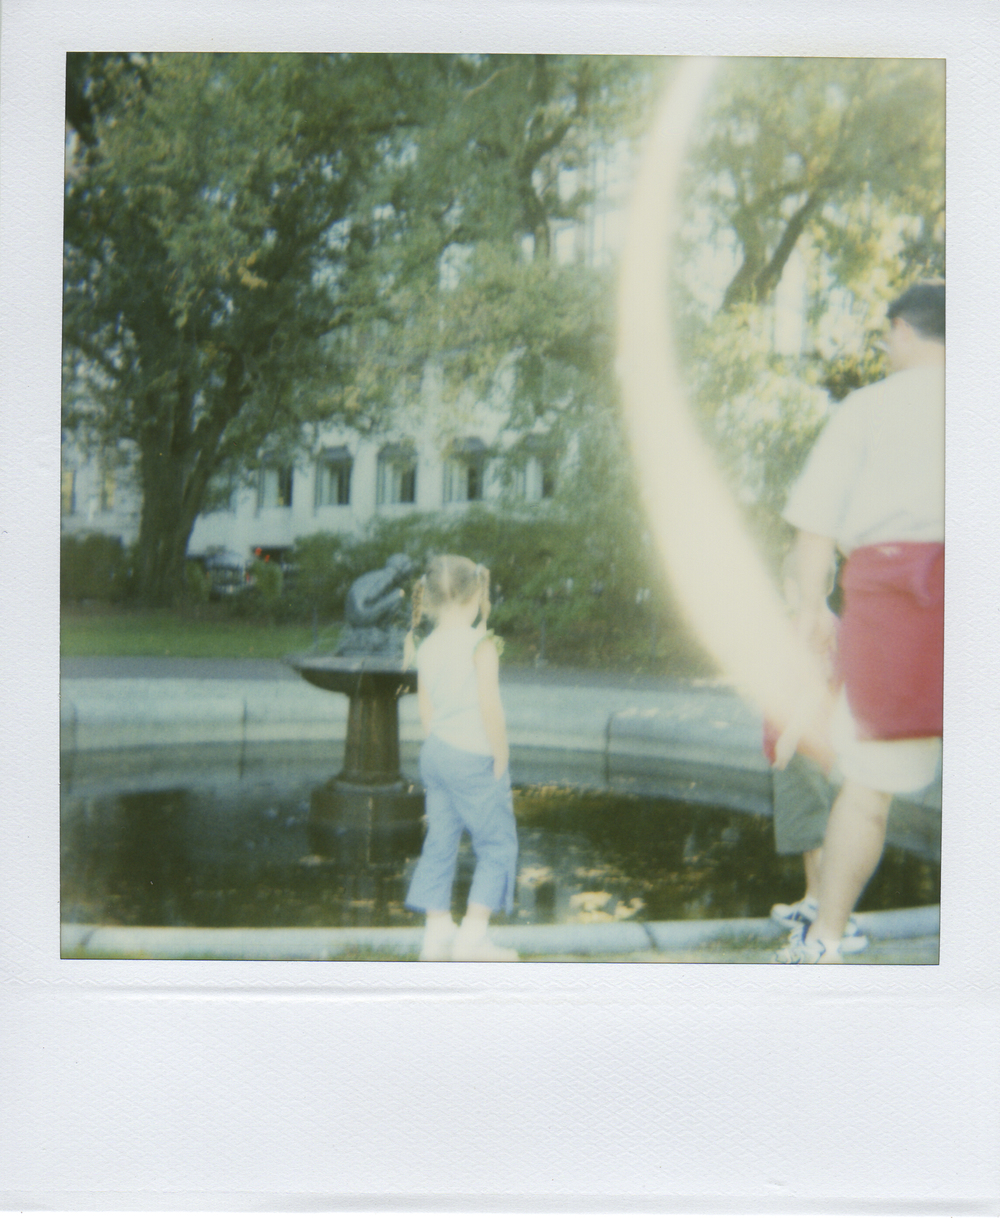 jlaurence-polaroid-071.jpg